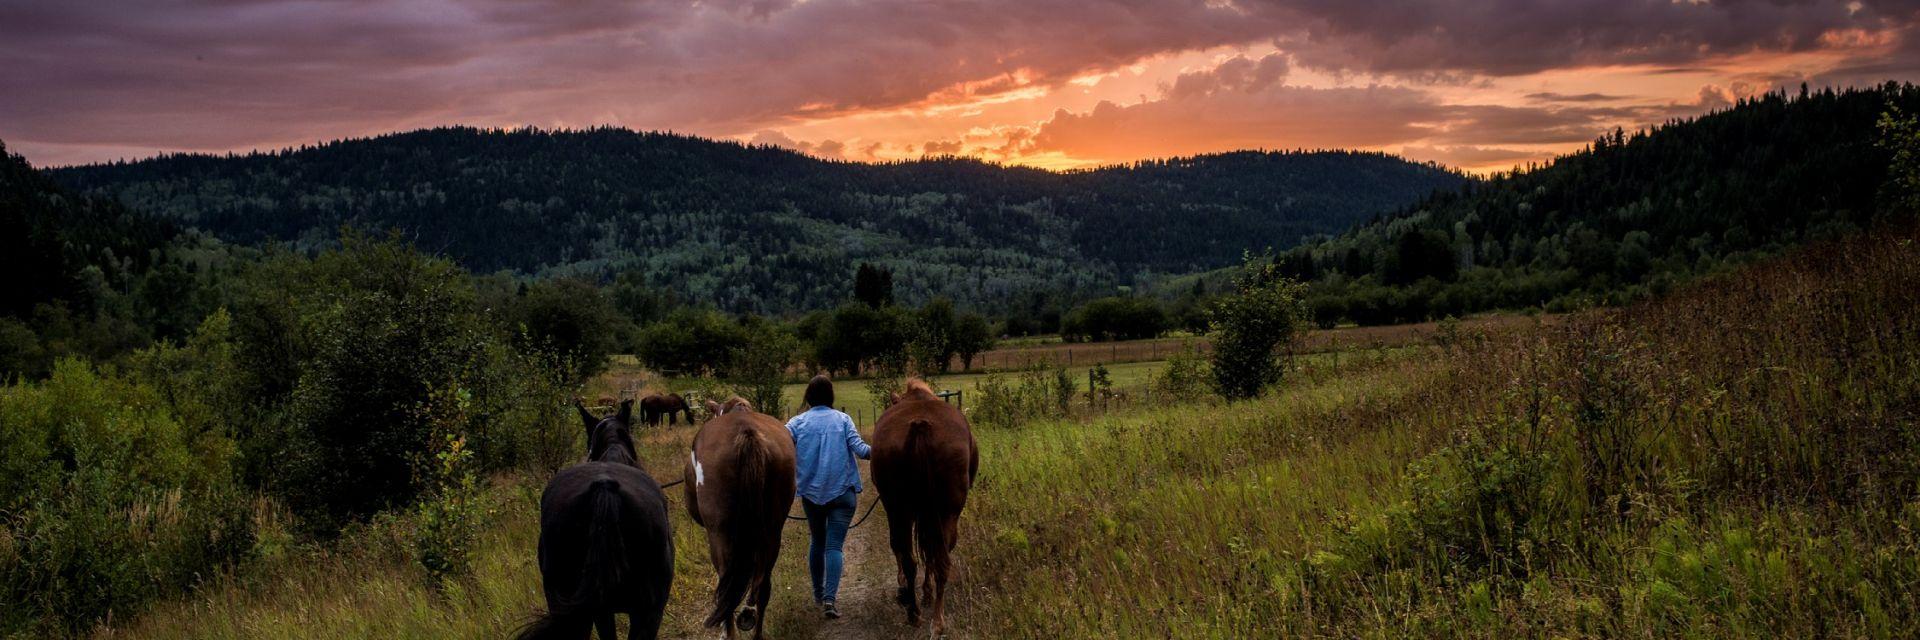 sunset horsback ride at Kayanara guest ranch, Eagle Creek, british columbia.